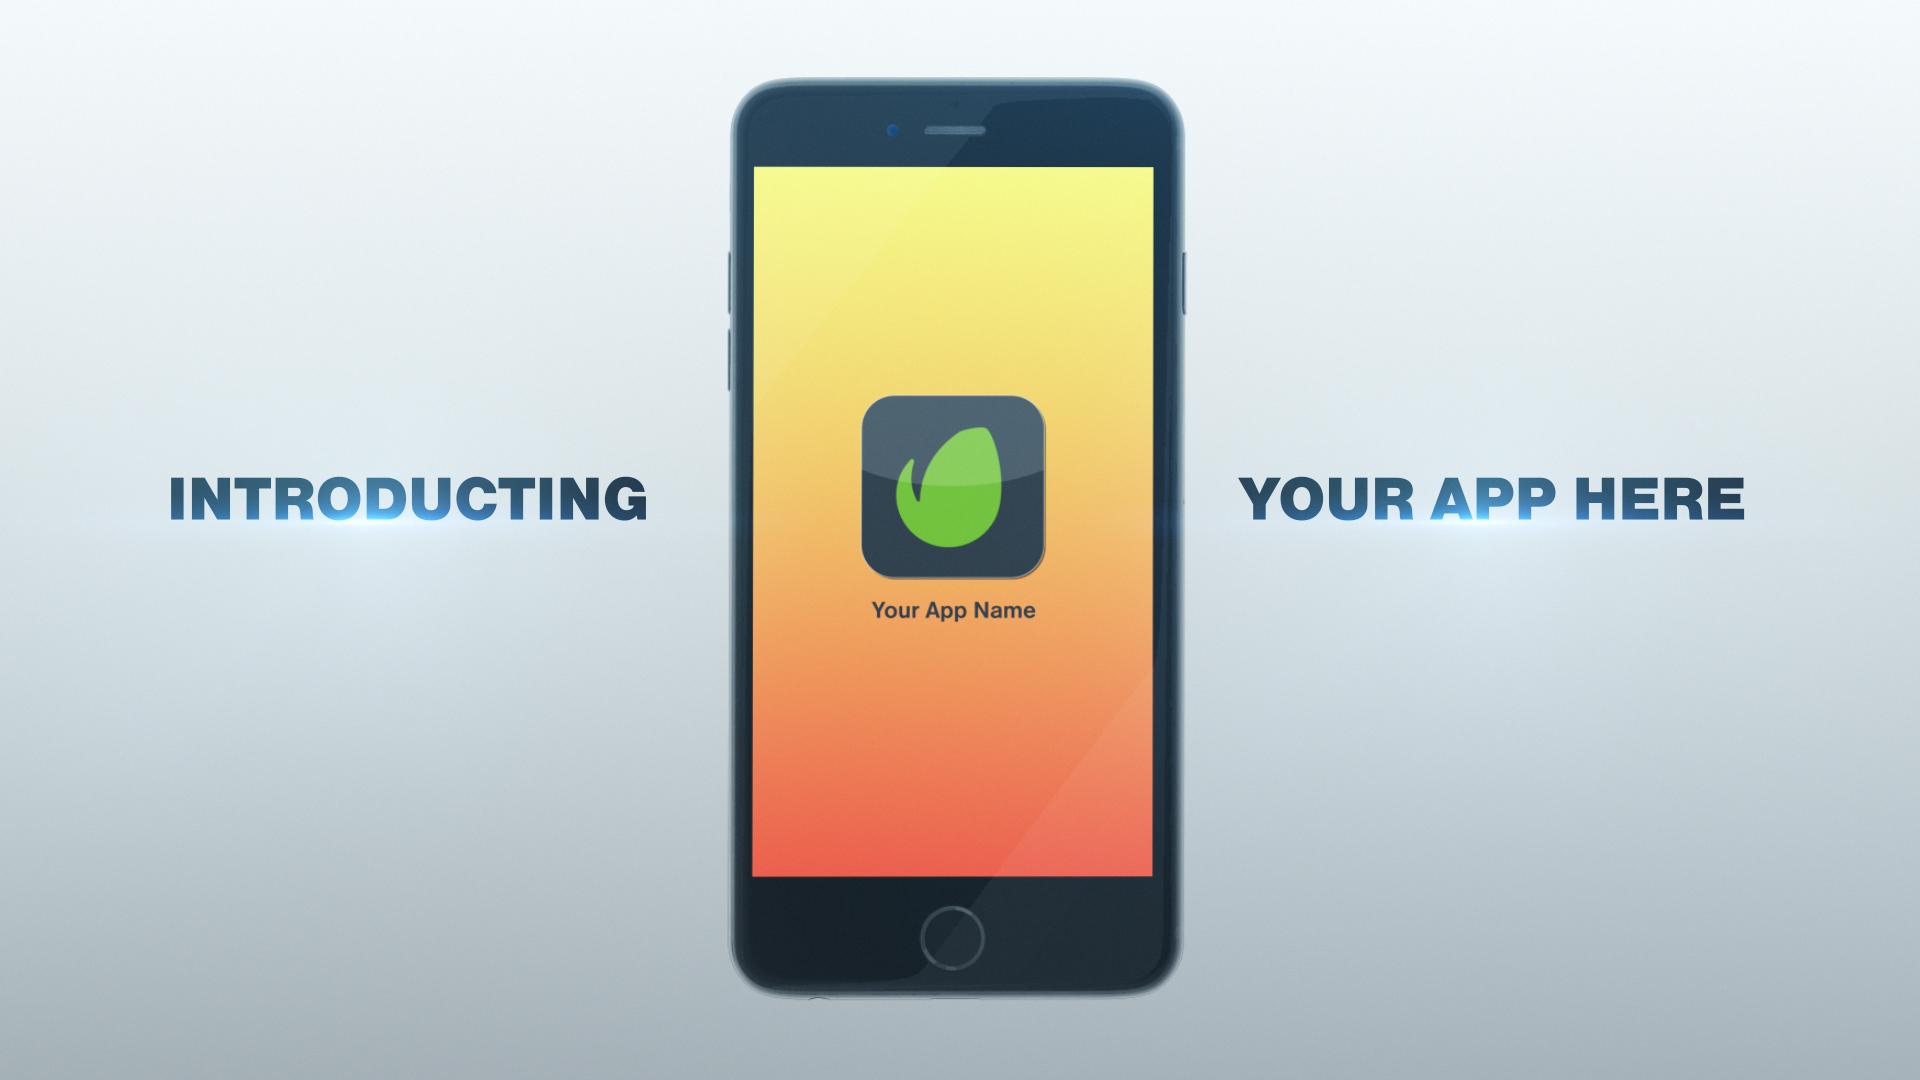 Phone_App_Promo_Kit_1080p_00294